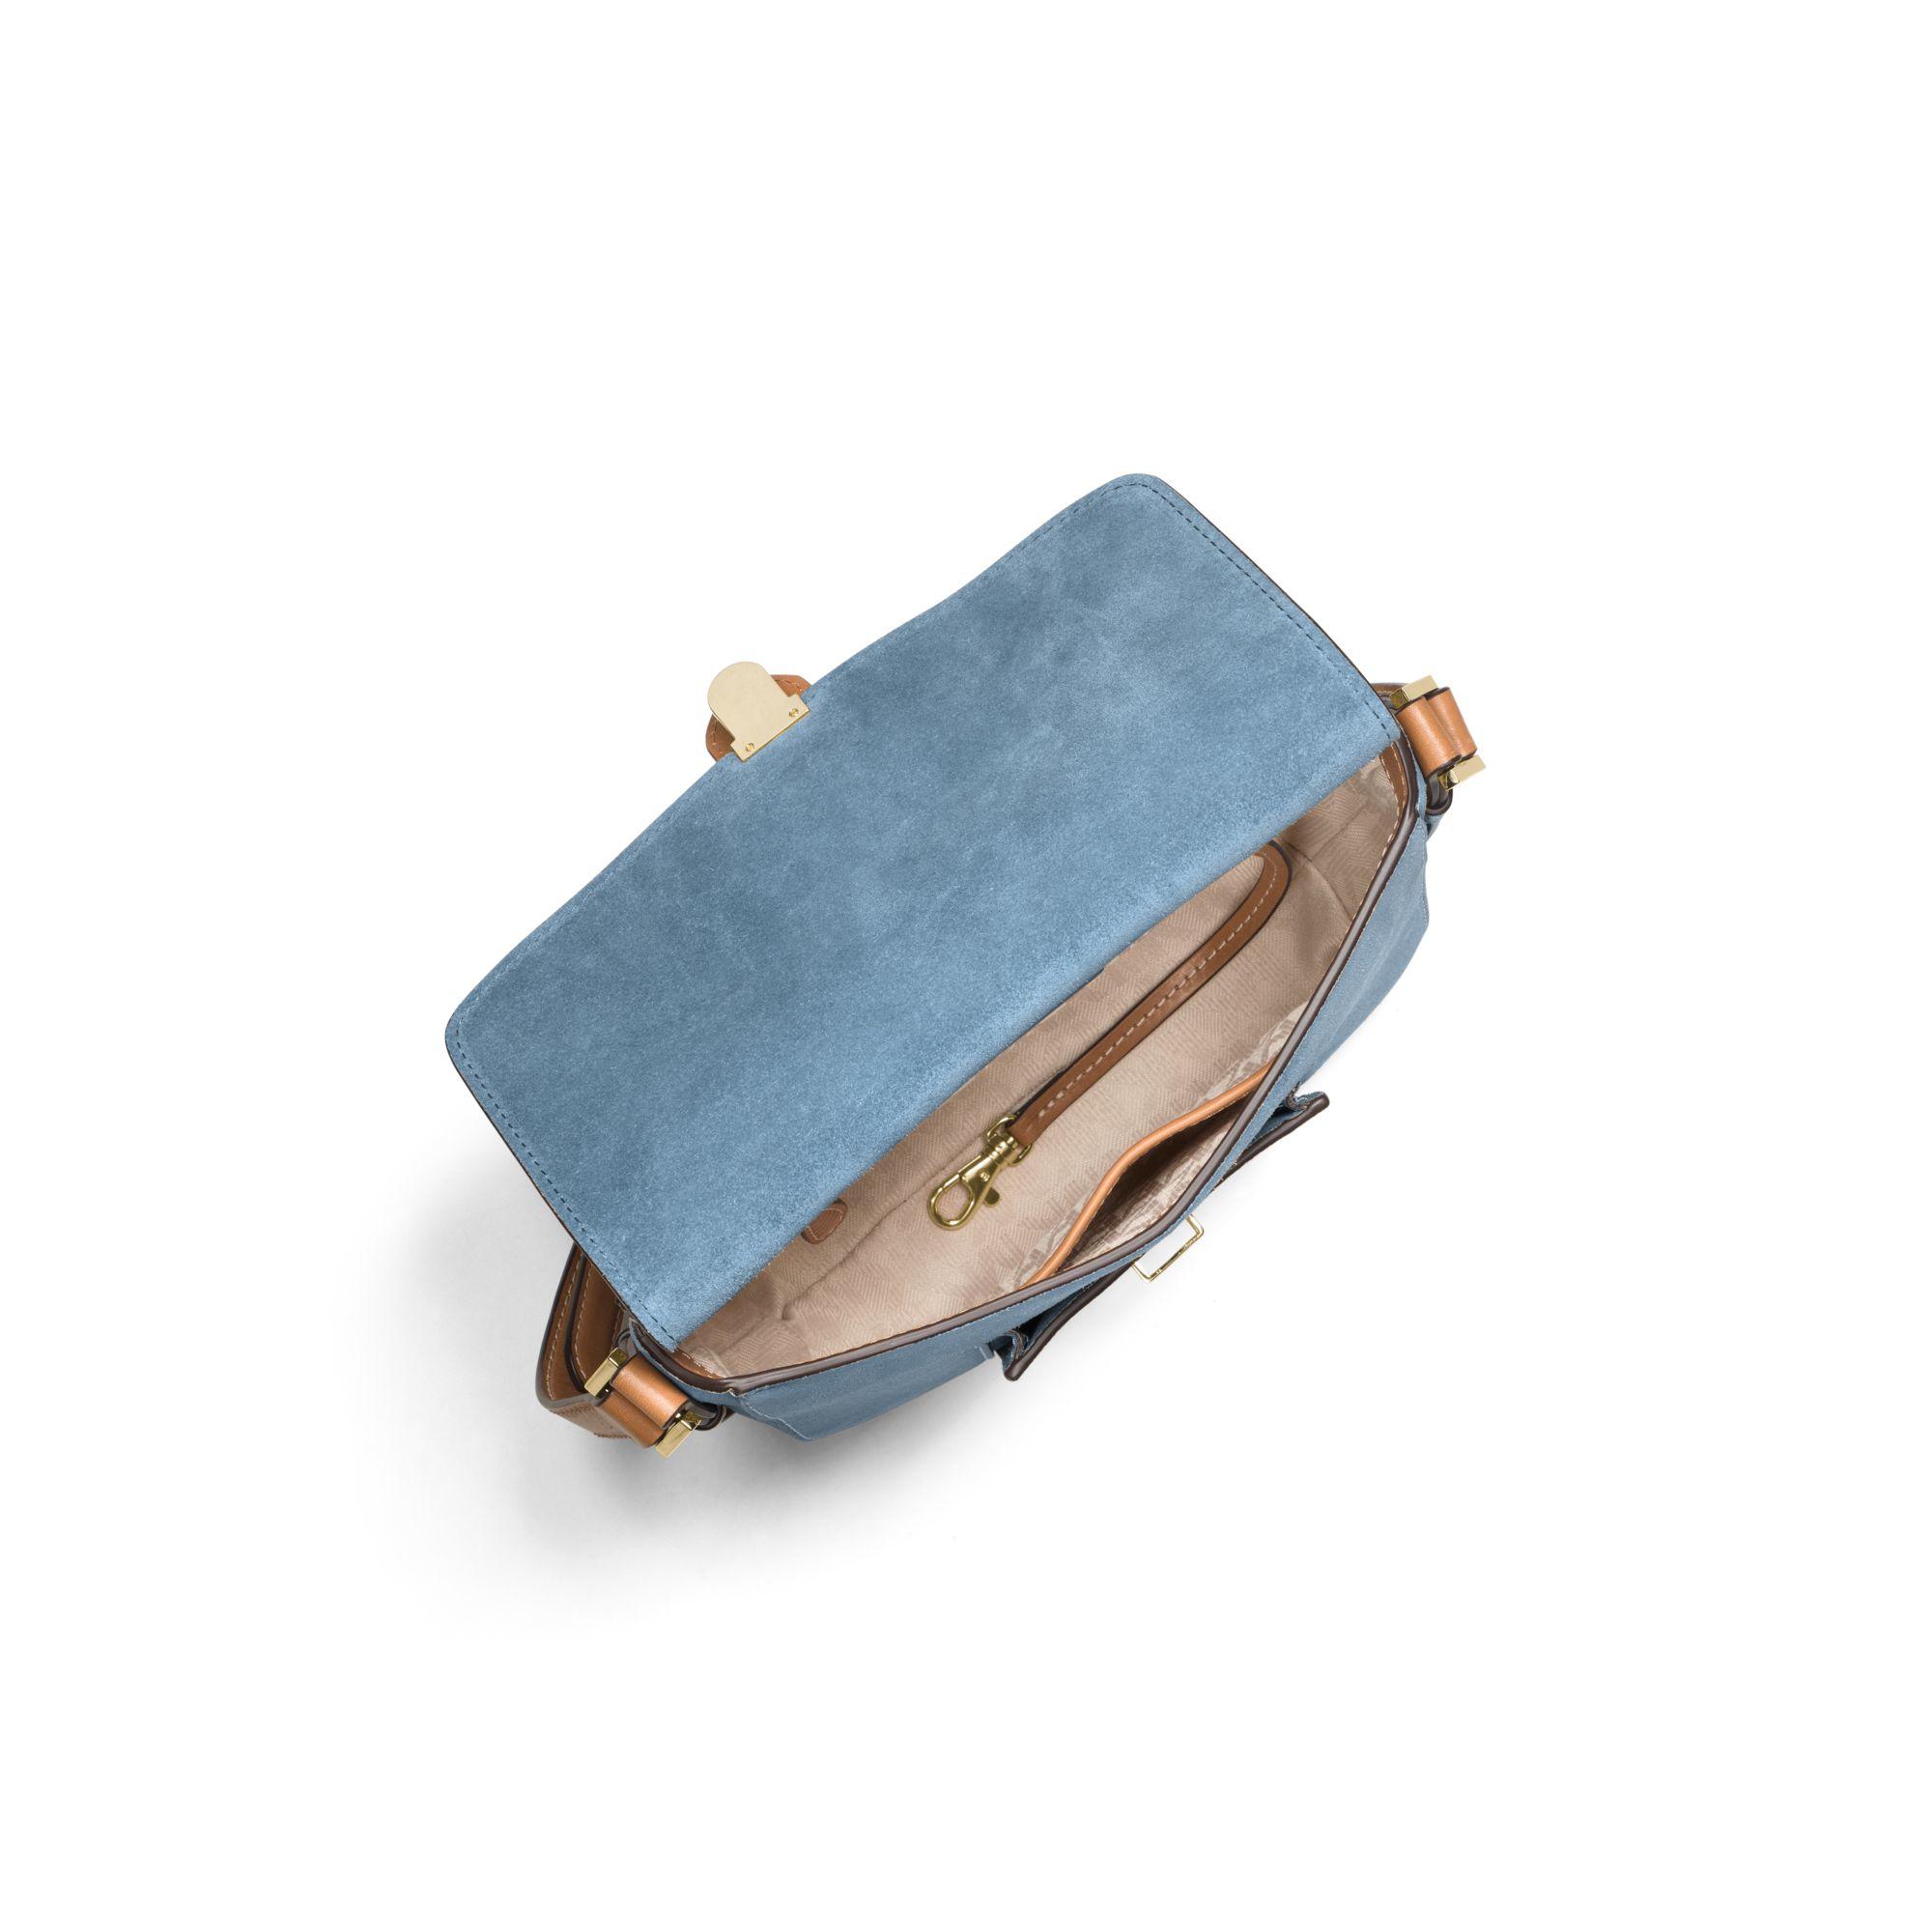 1a4e0dbb44c613 Michael Kors Romy Medium Suede Crossbody in Blue - Lyst